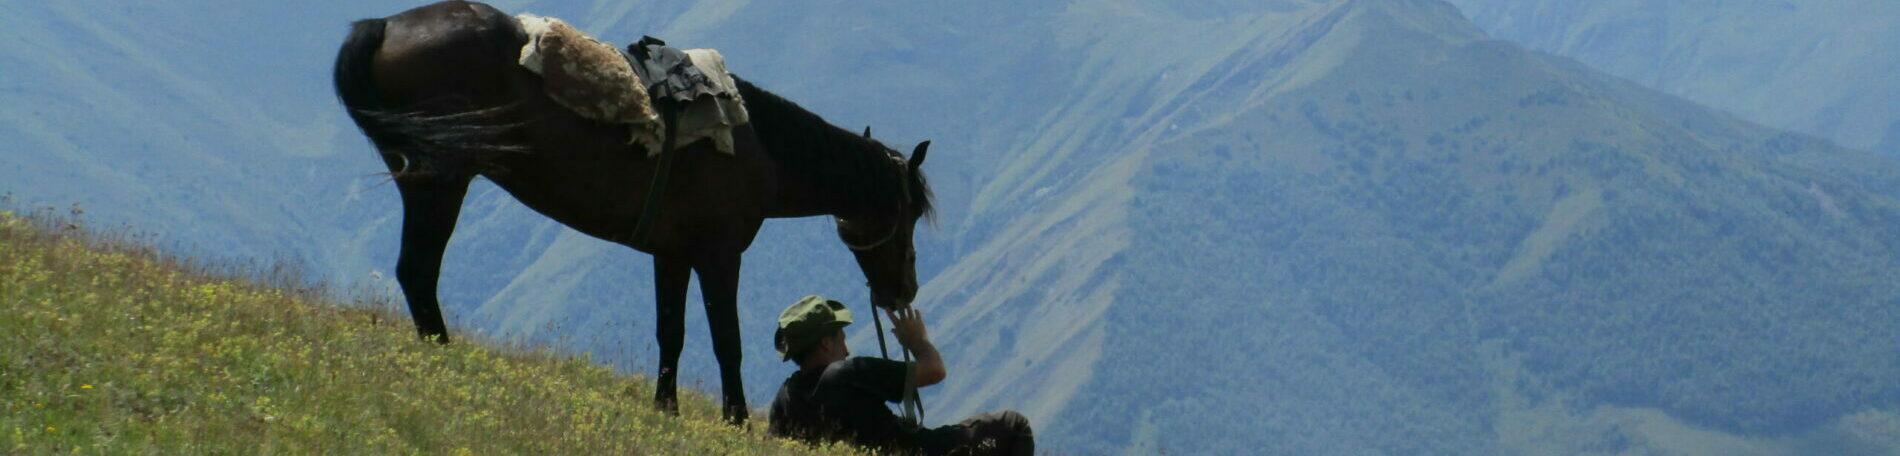 Wandern in Georgien mit Pferden